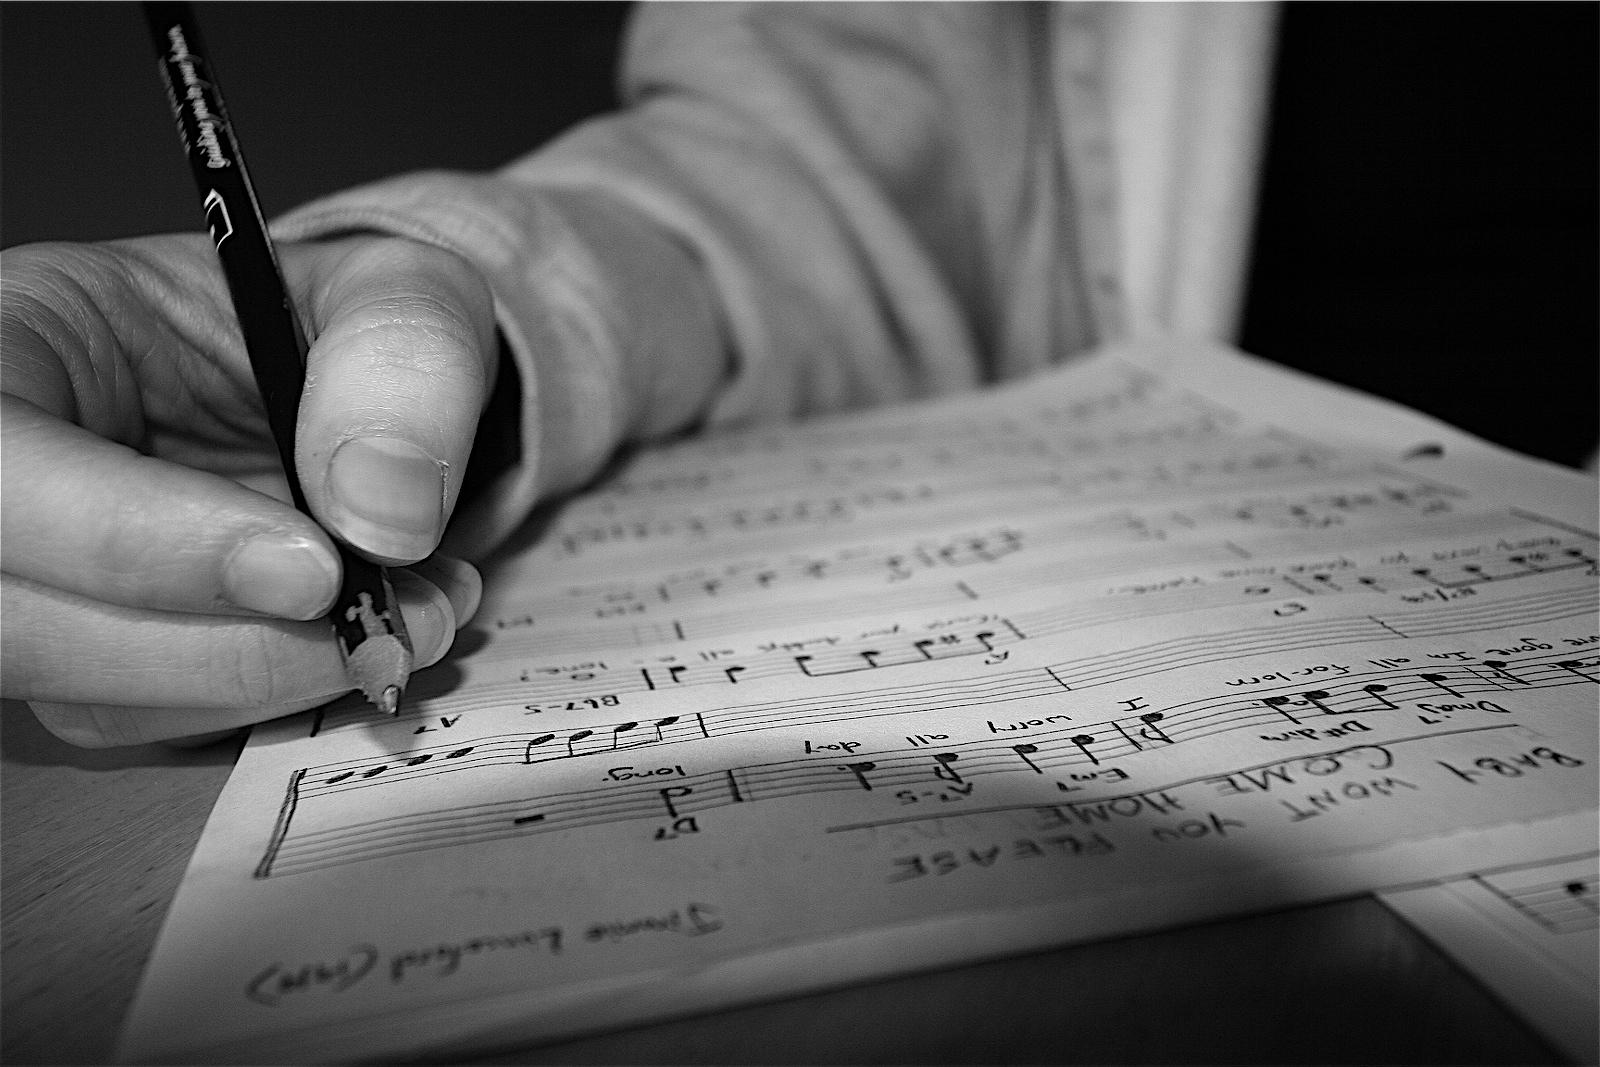 sheet-music-writing-the-art-of-writing-RKVC